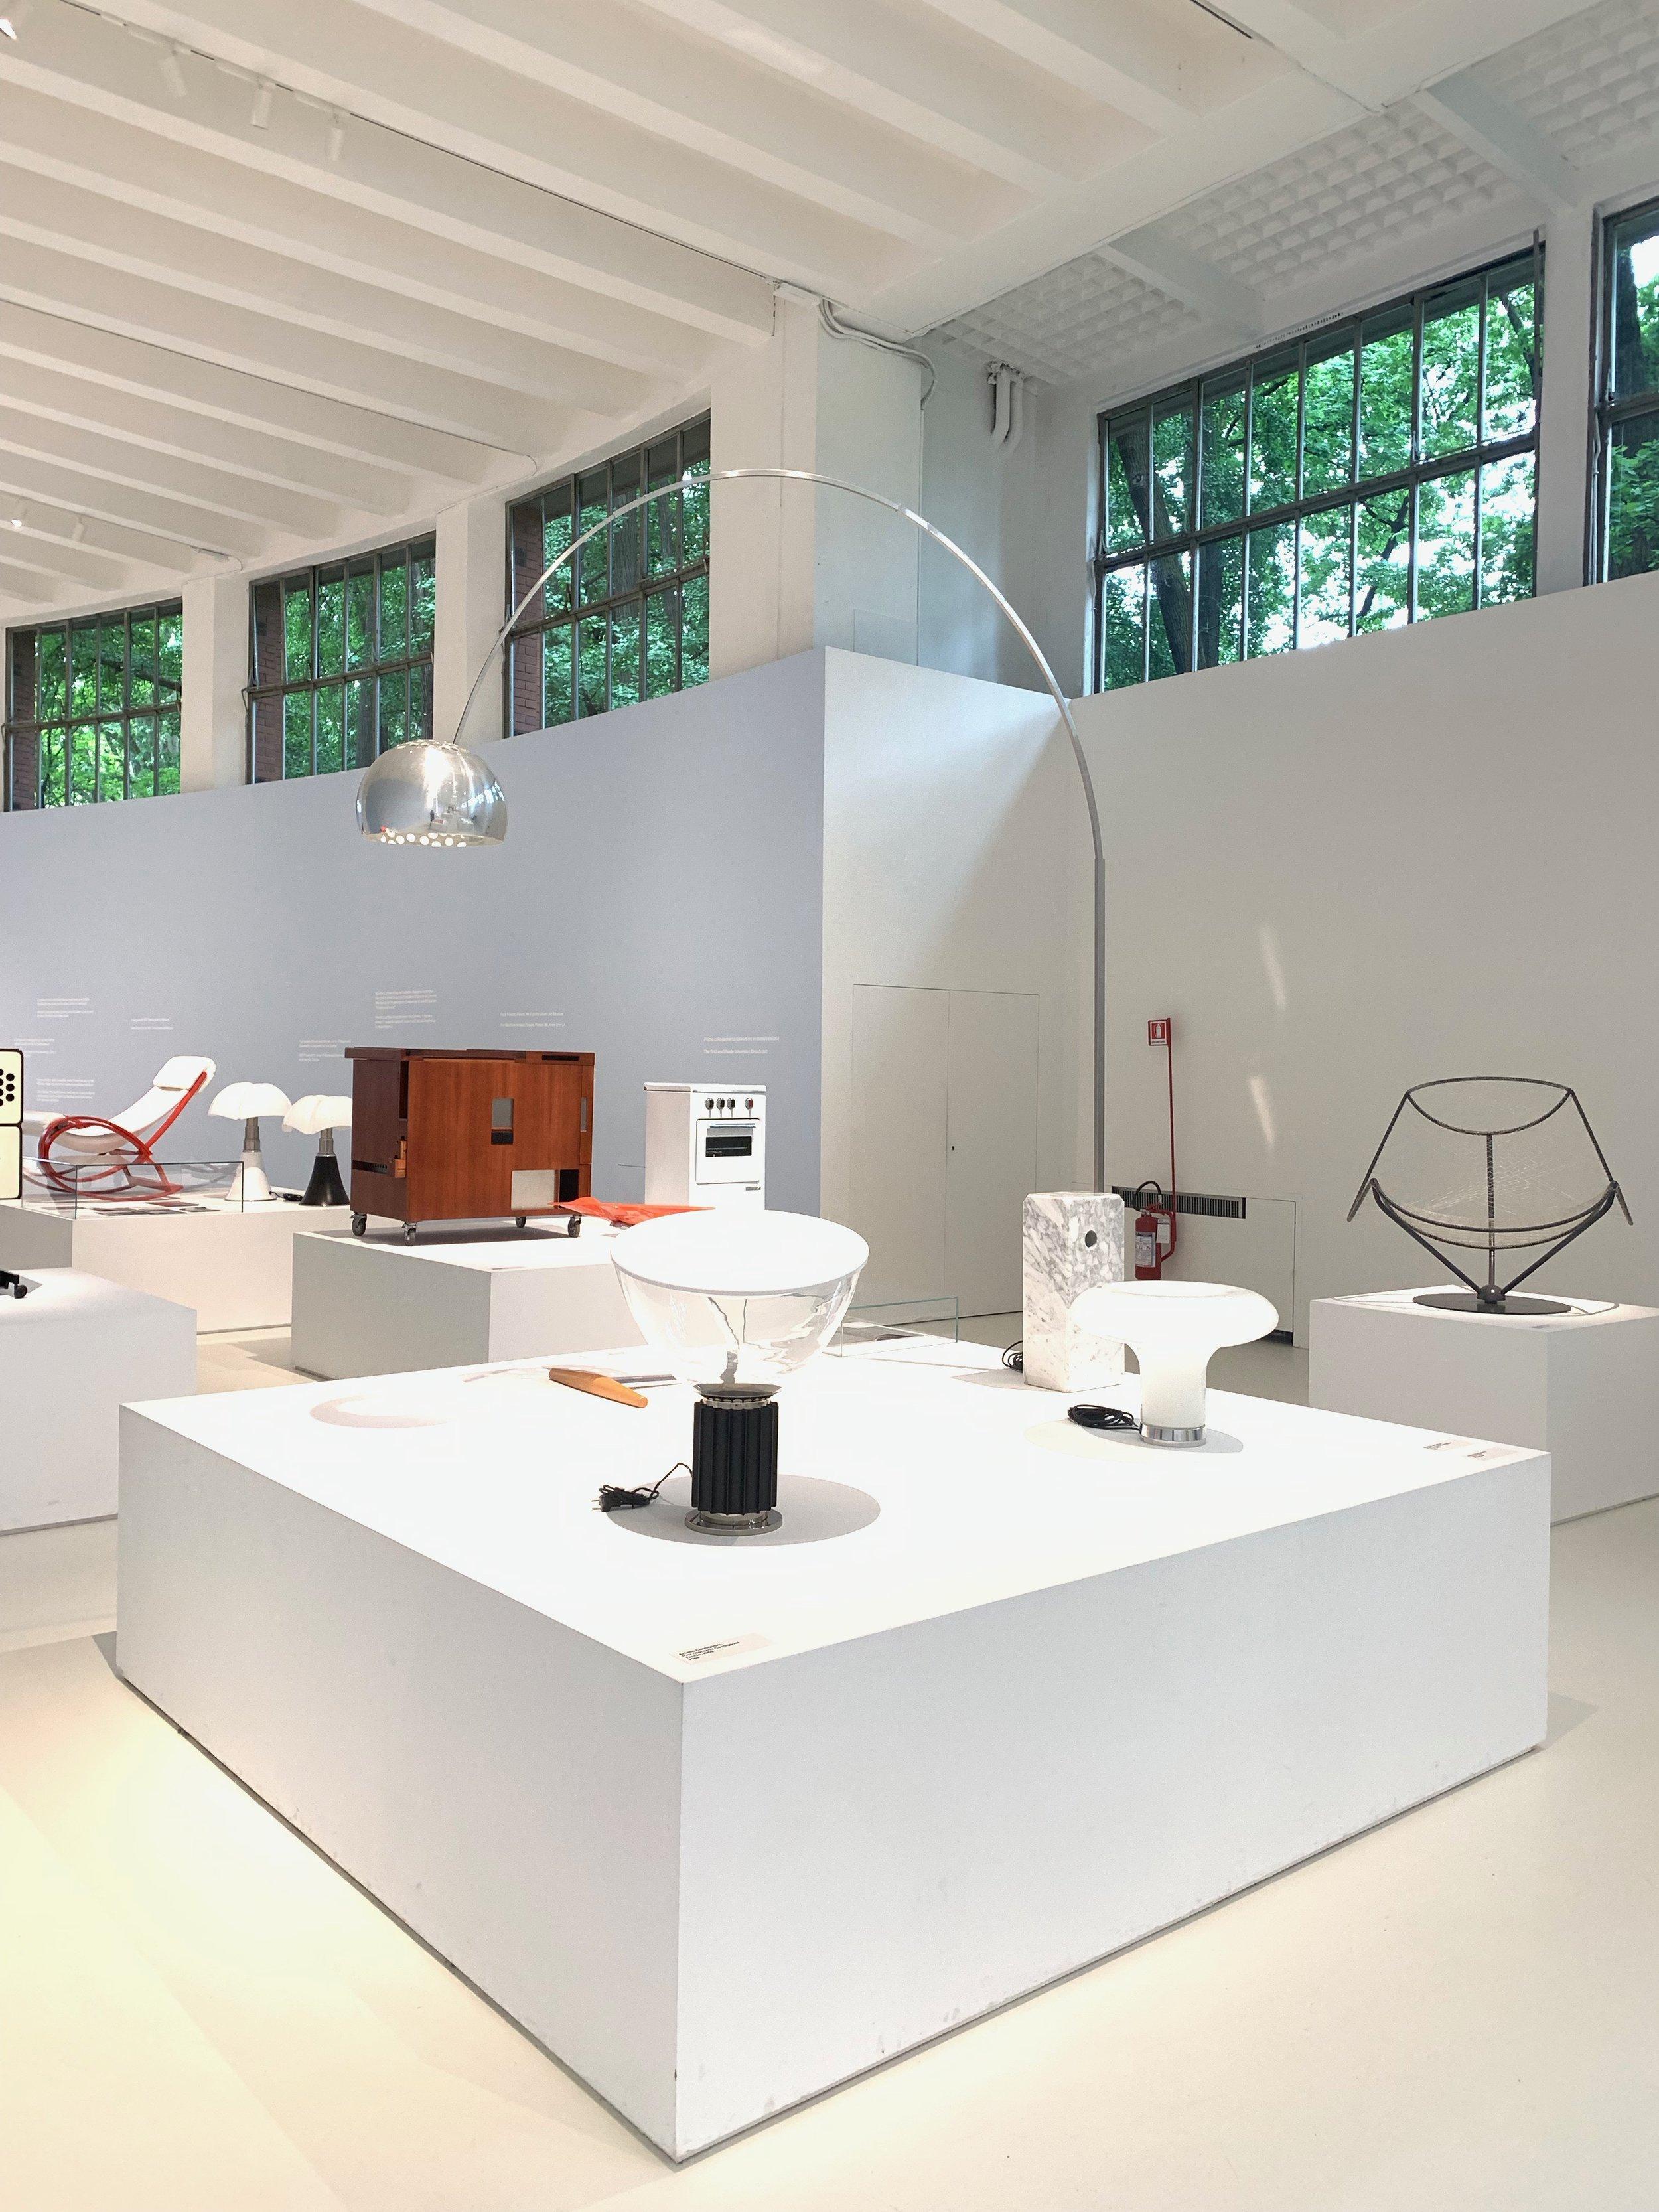 Museum Of Italian Design - Italian Mid Century Modern Furniture Designitalia00015.jpeg